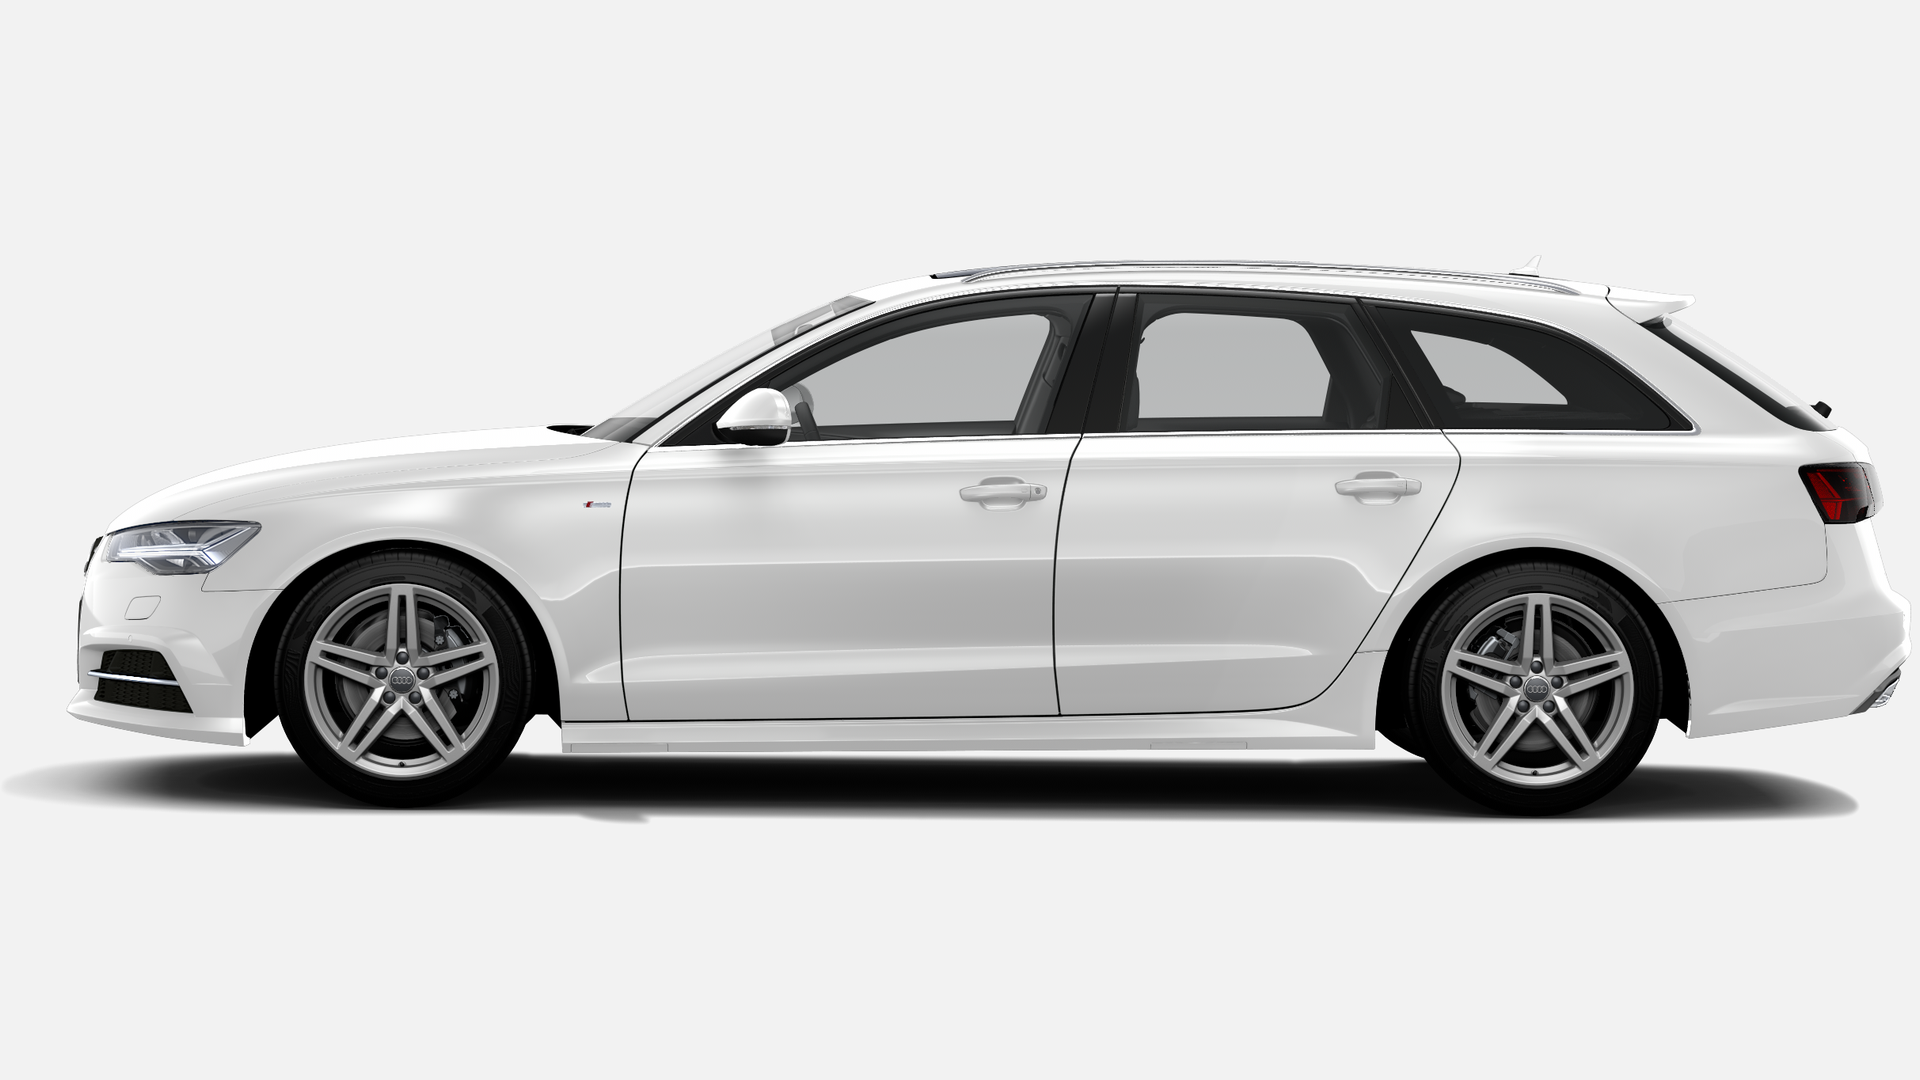 Vista Lateral izquierda de Audi A6 Avant 2.0 TDI line ultra S tronic 140 kW (190 CV)